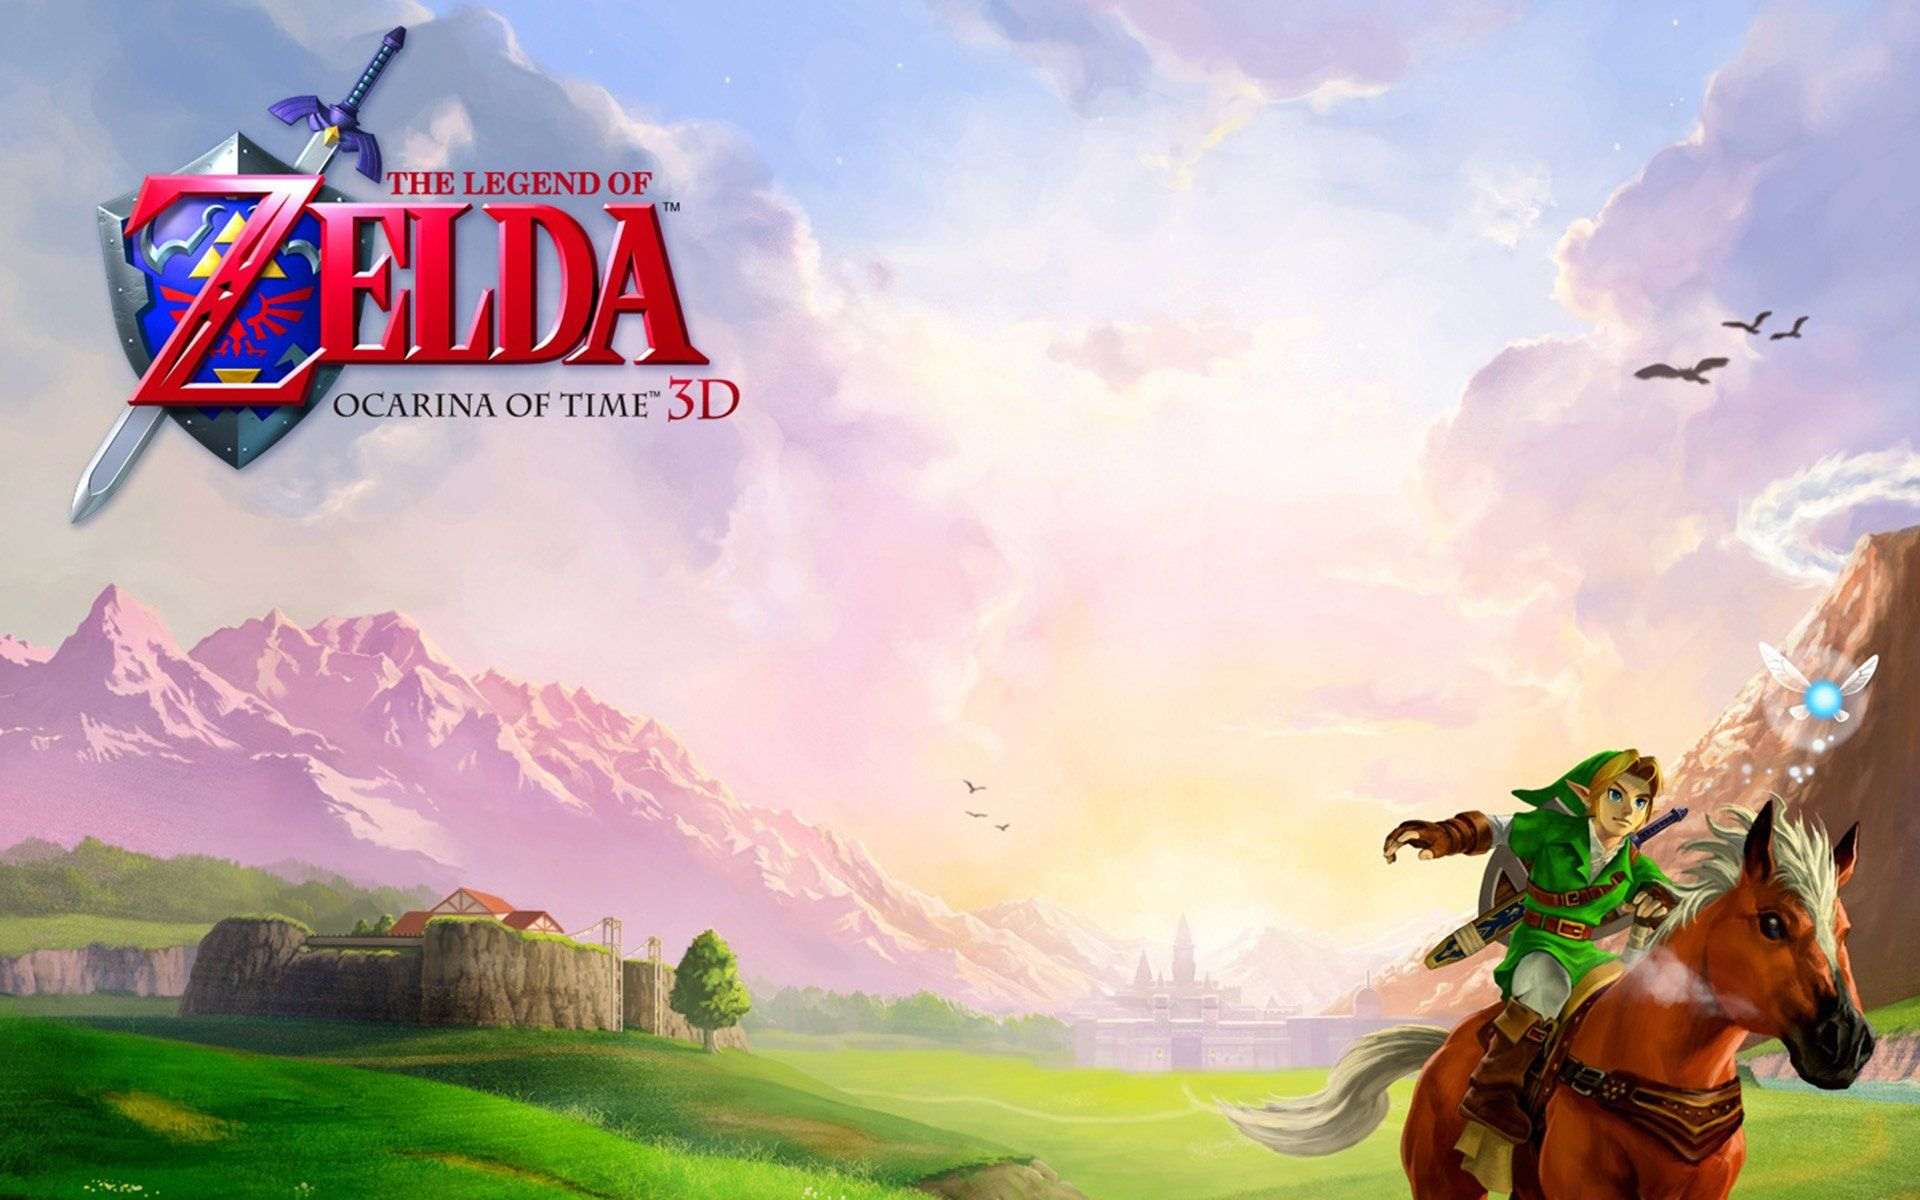 The Legend Of Zelda Ocarina Of Time Wallpaper 1280 1024 Zelda Ocarina Of Time Wallpapers 27 Wallpapers Adorable Ocarina Of Time Zelda Art Legend Of Zelda